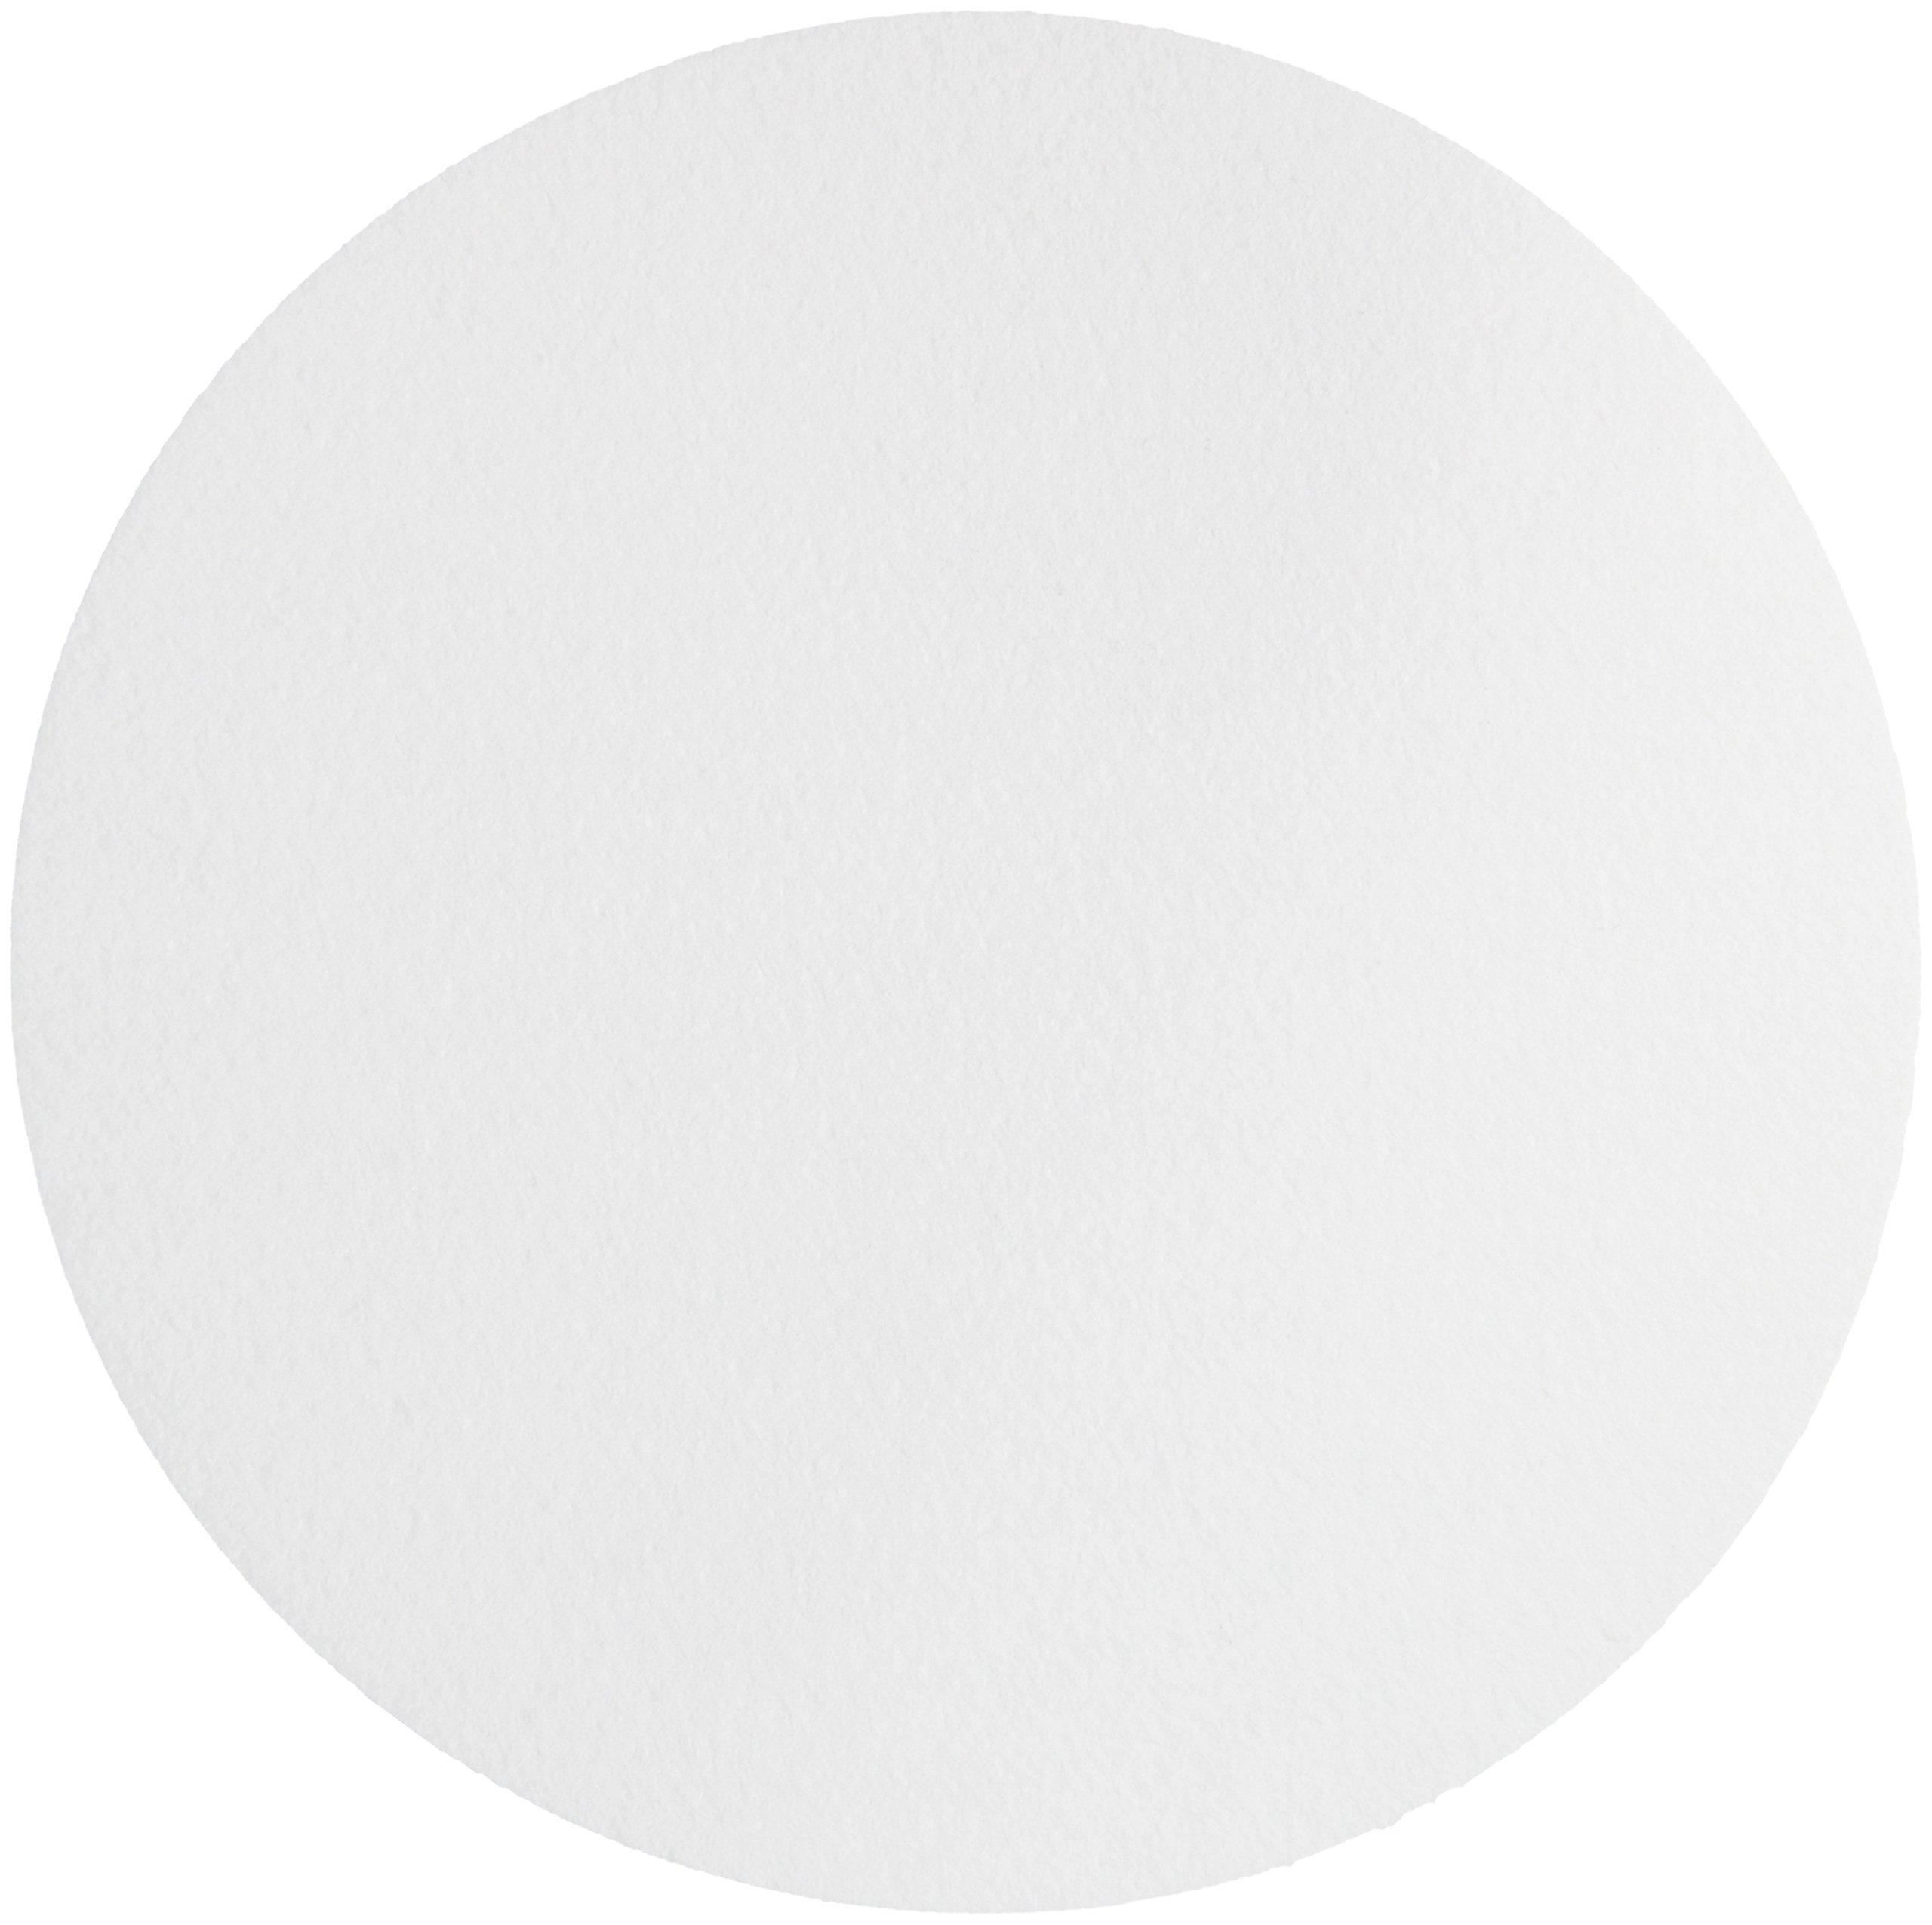 Whatman 1001-6508 Quantitative Filter Paper Circles, 11 Micron, 10.5 s/100mL/sq inch Flow Rate, Grade 1, 10mm Diameter (Pack of 100) by Whatman